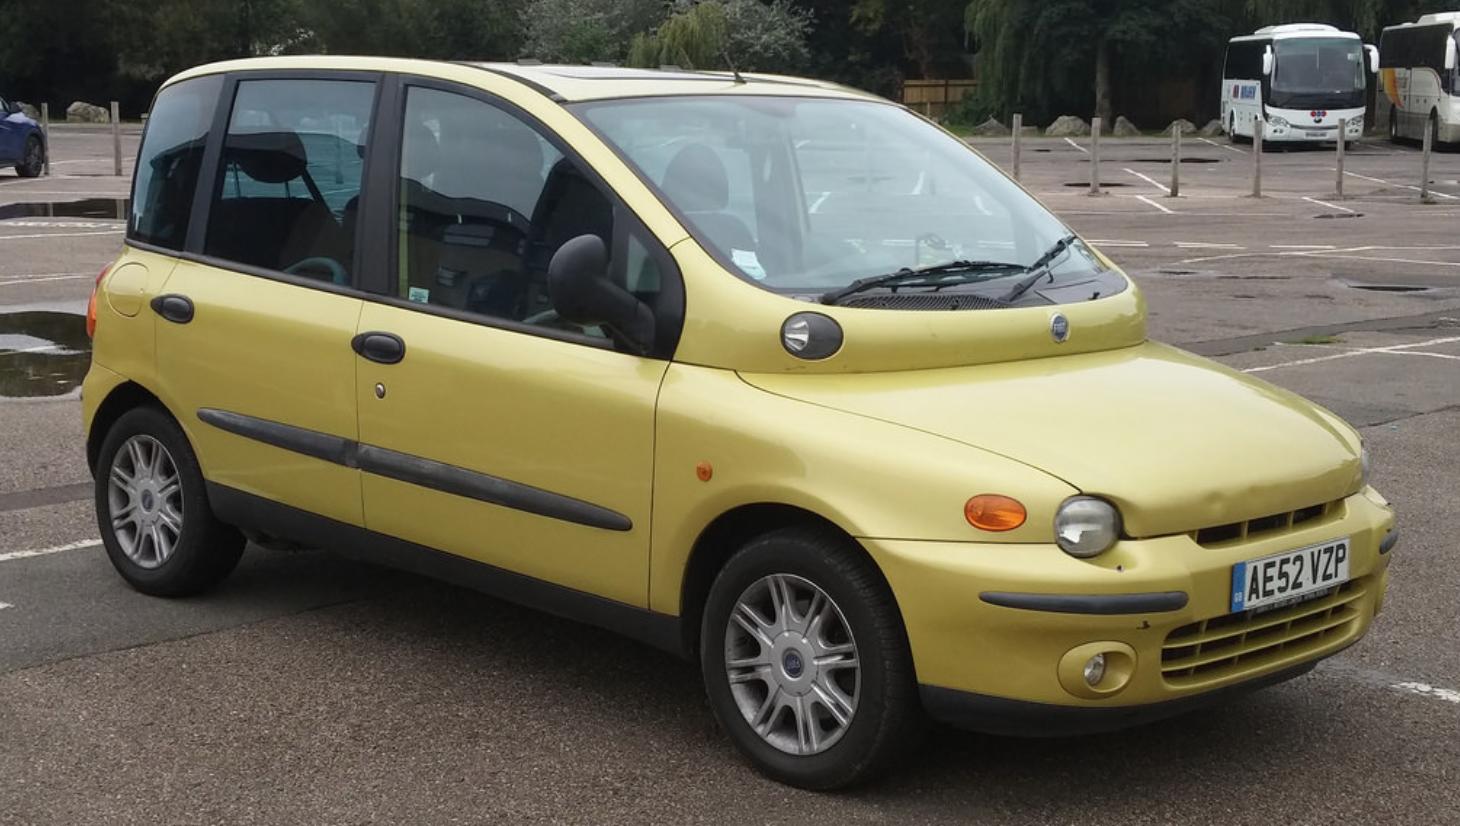 Fiat Multipla Lelijke Auto's auto